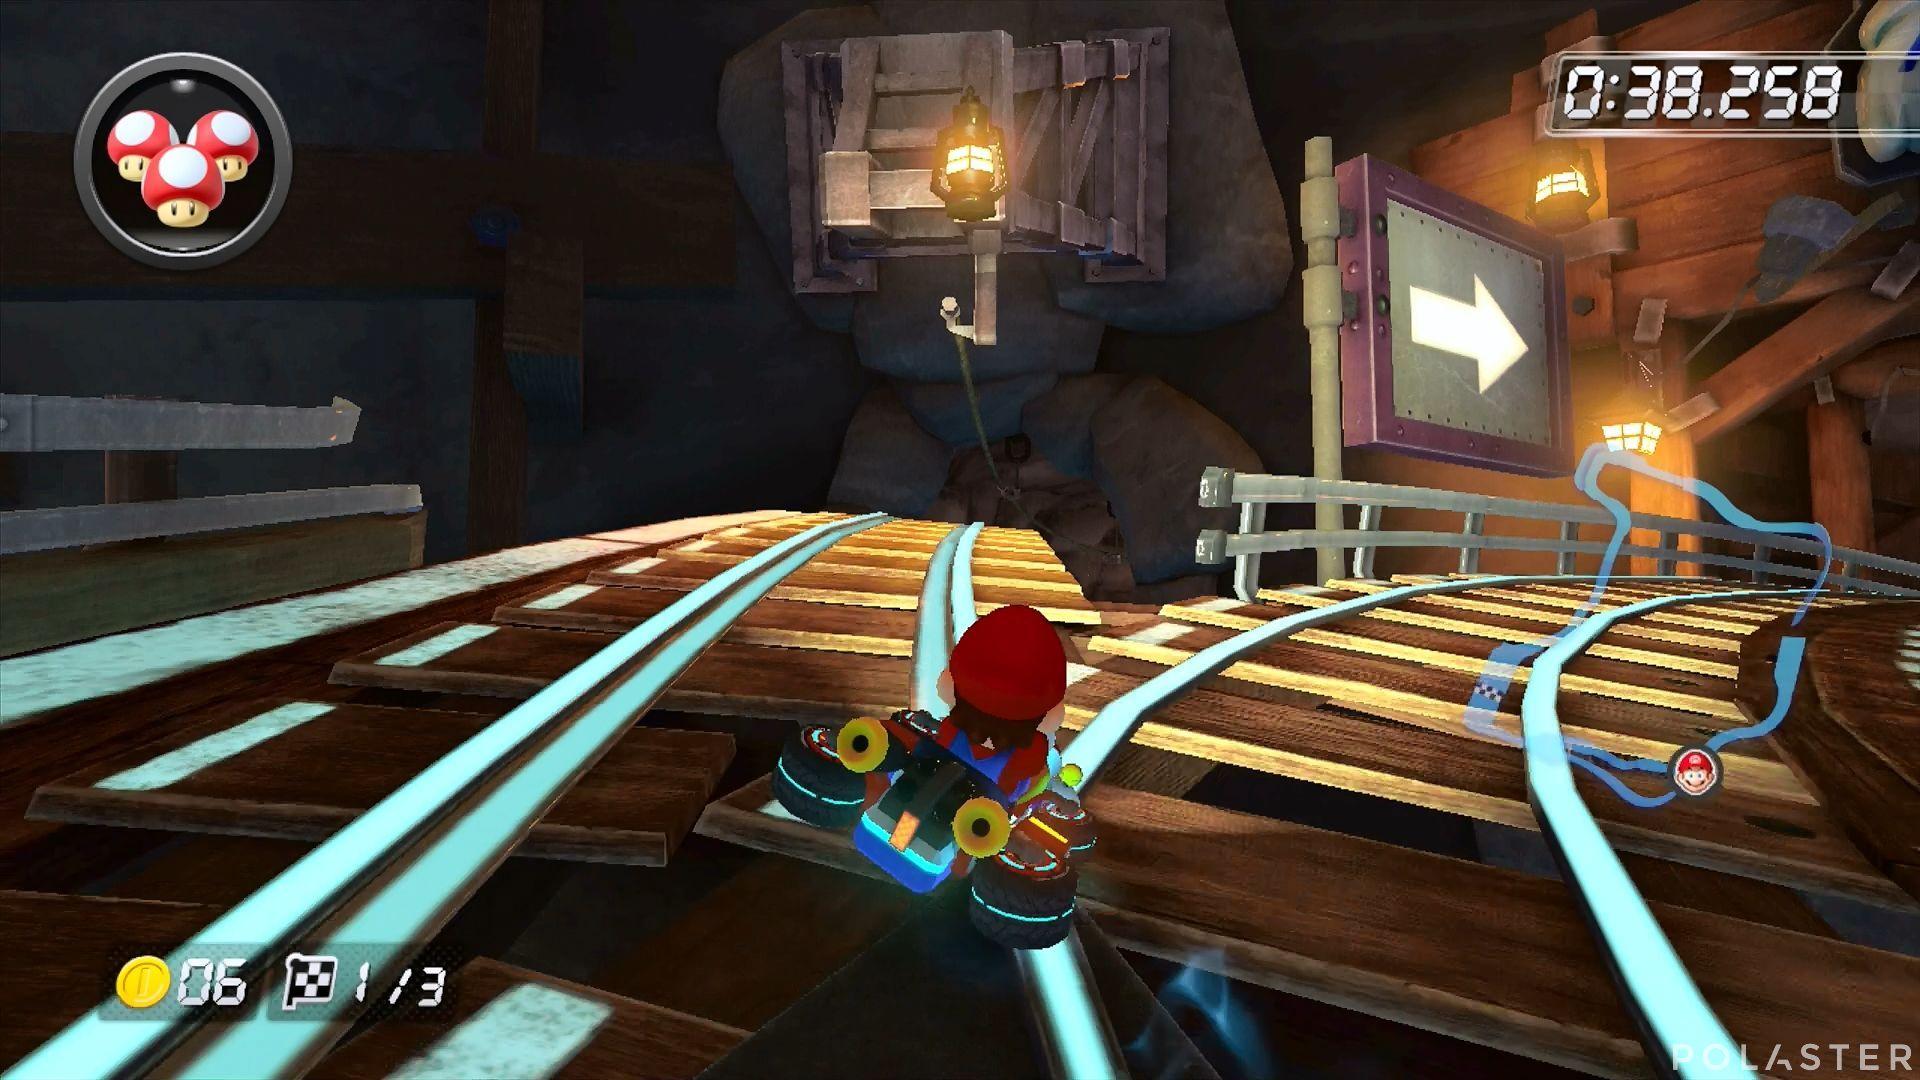 Mario Kart 8 - Mina de Wario